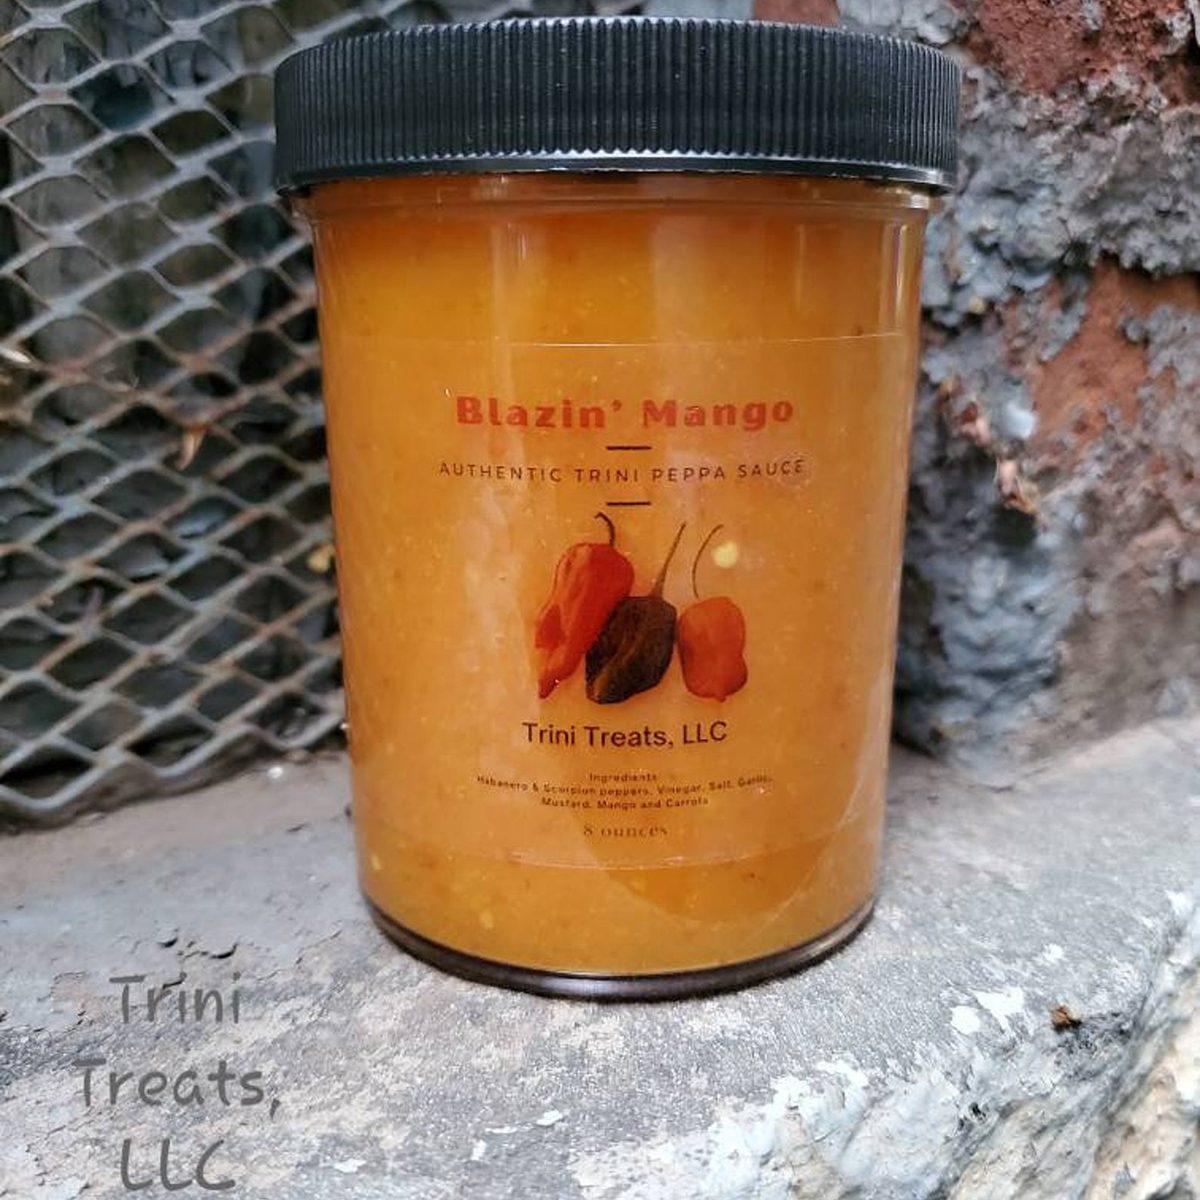 Trinidadian Blazin Mango Sauce